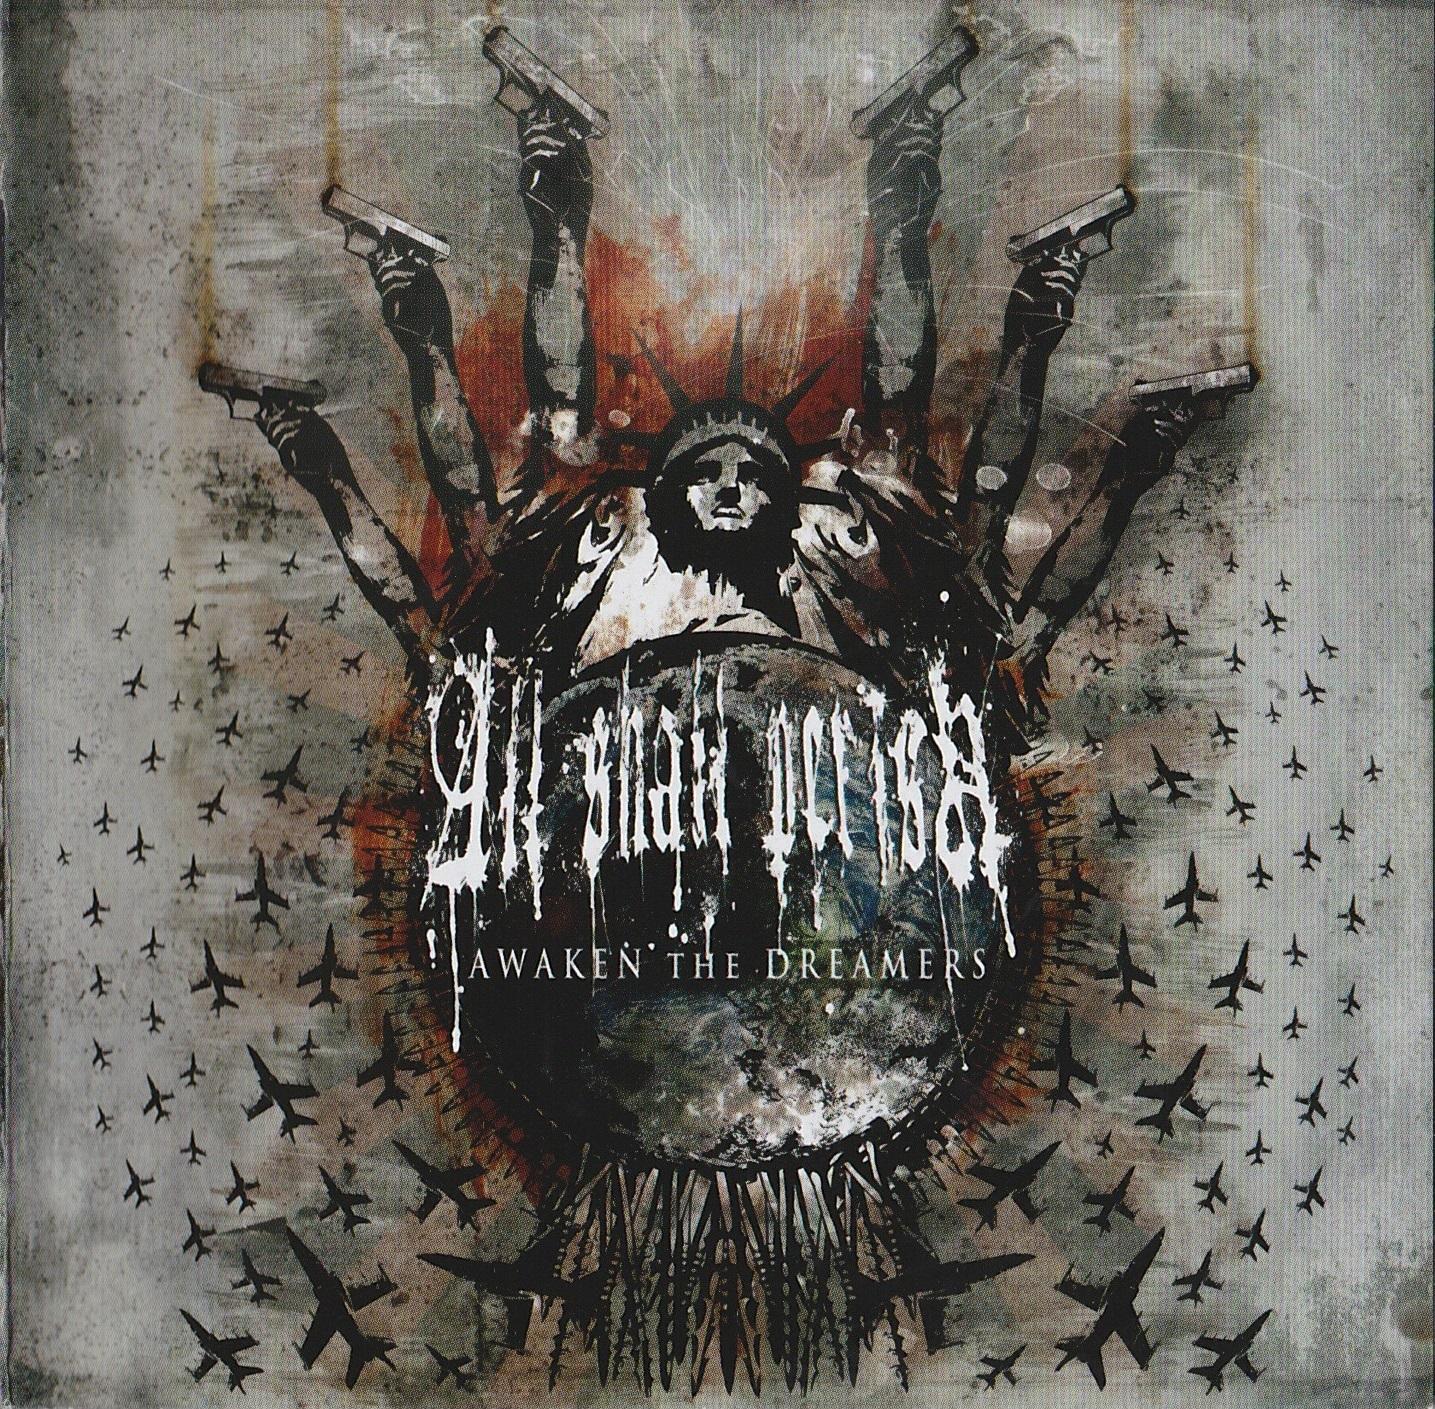 All Shall Perish — Awaken The Dreamers (2008)